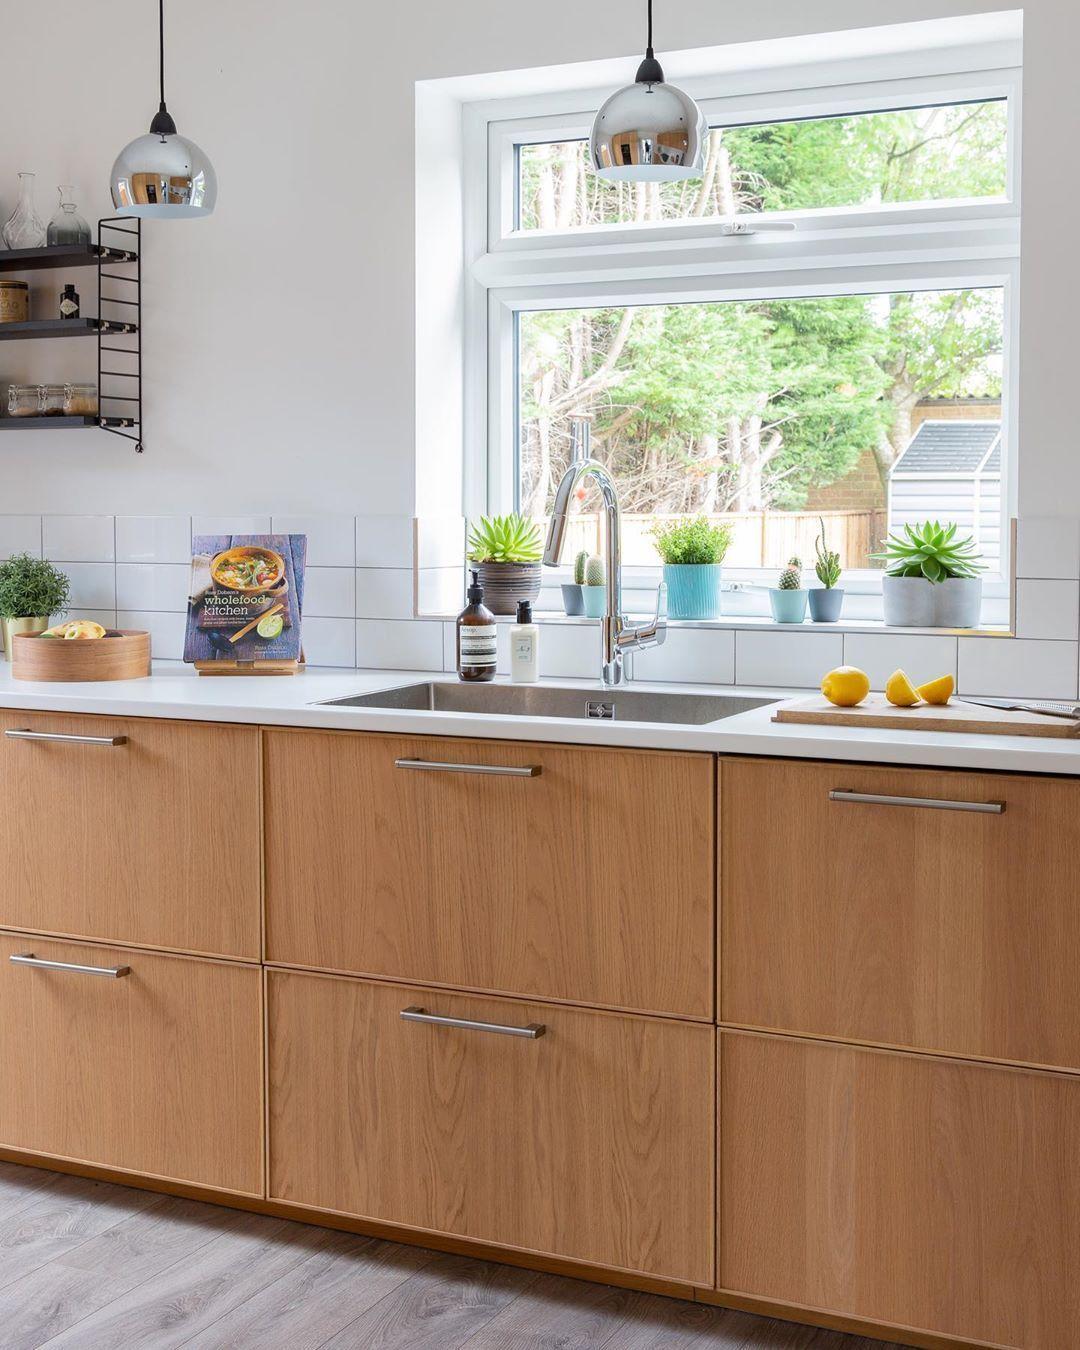 Ikea Kitchens 2020 Usa